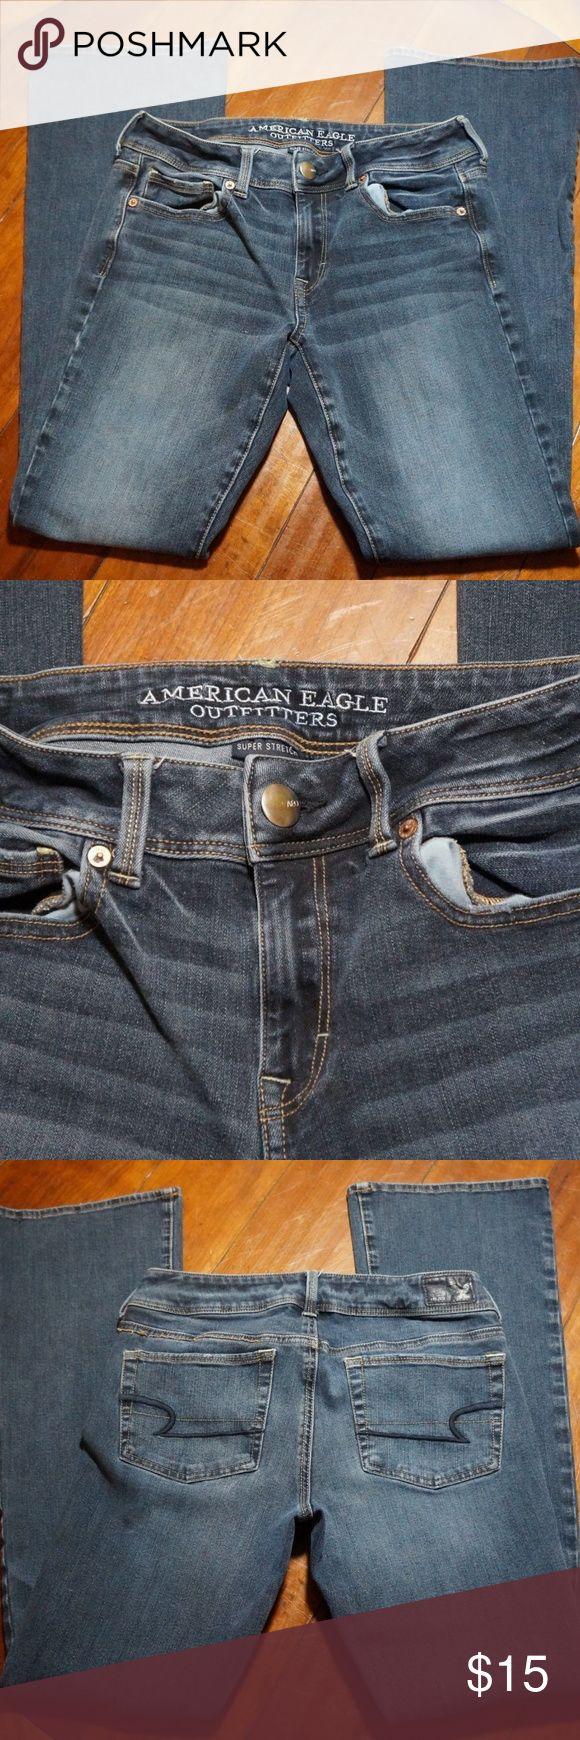 Womans AEO Denim American Eagle Super Stretch Jean DESCRIPTION: Womans AEO Denim American Eagle Super Stretch Jeans Size 6 American Eagle Outfitters Jeans